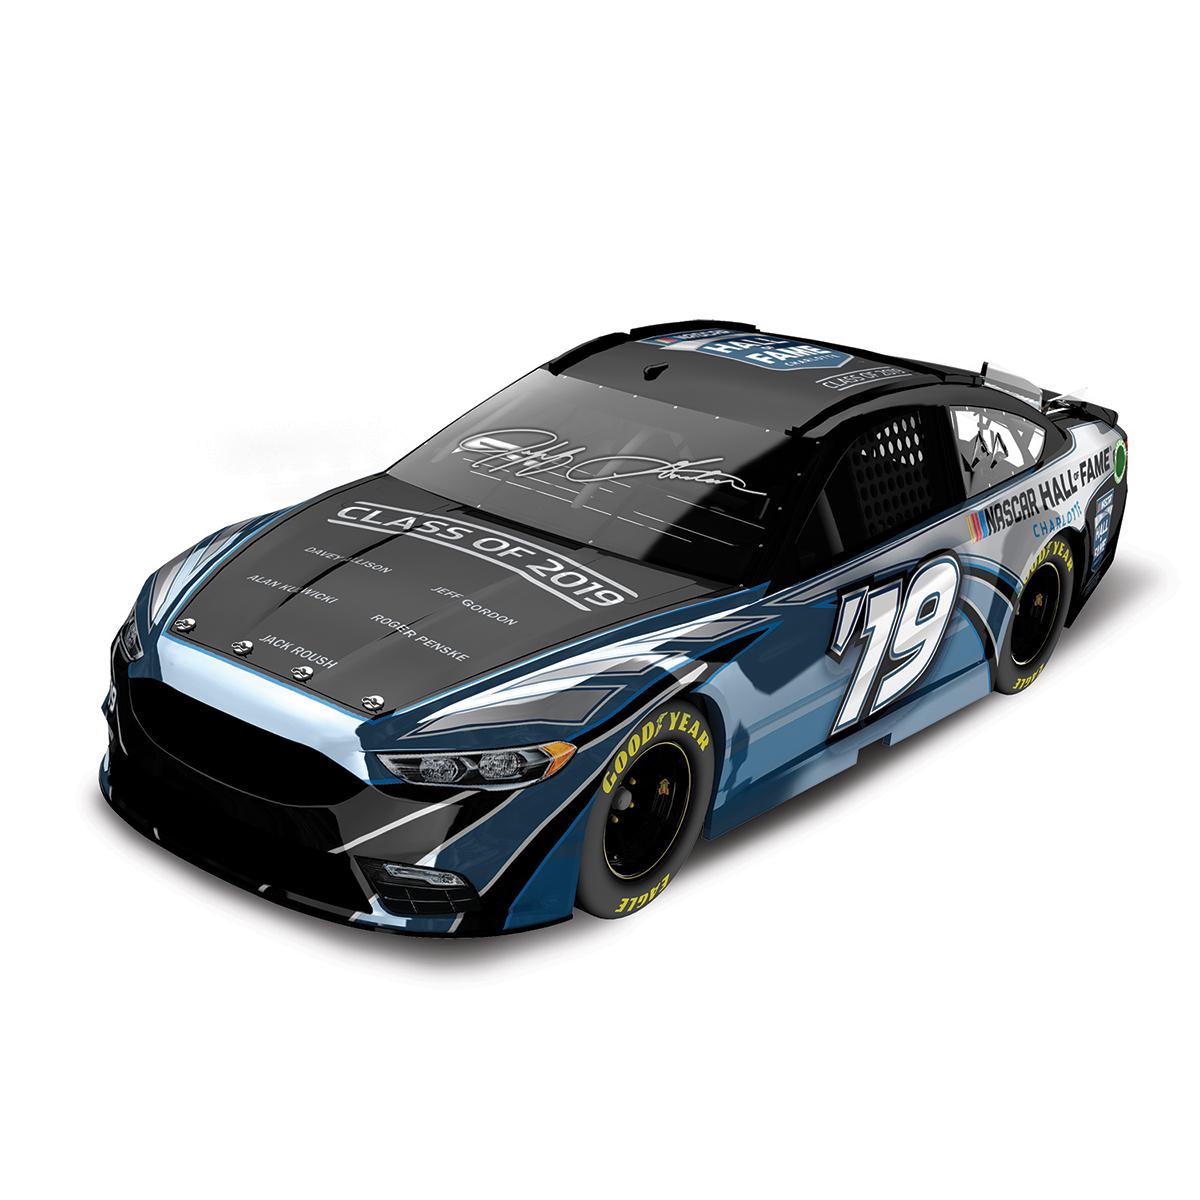 Autographed Jeff Gordon NASCAR Hall of Fame Class of 2019 Color Chrome ARC 1:24 Scale Die Cast